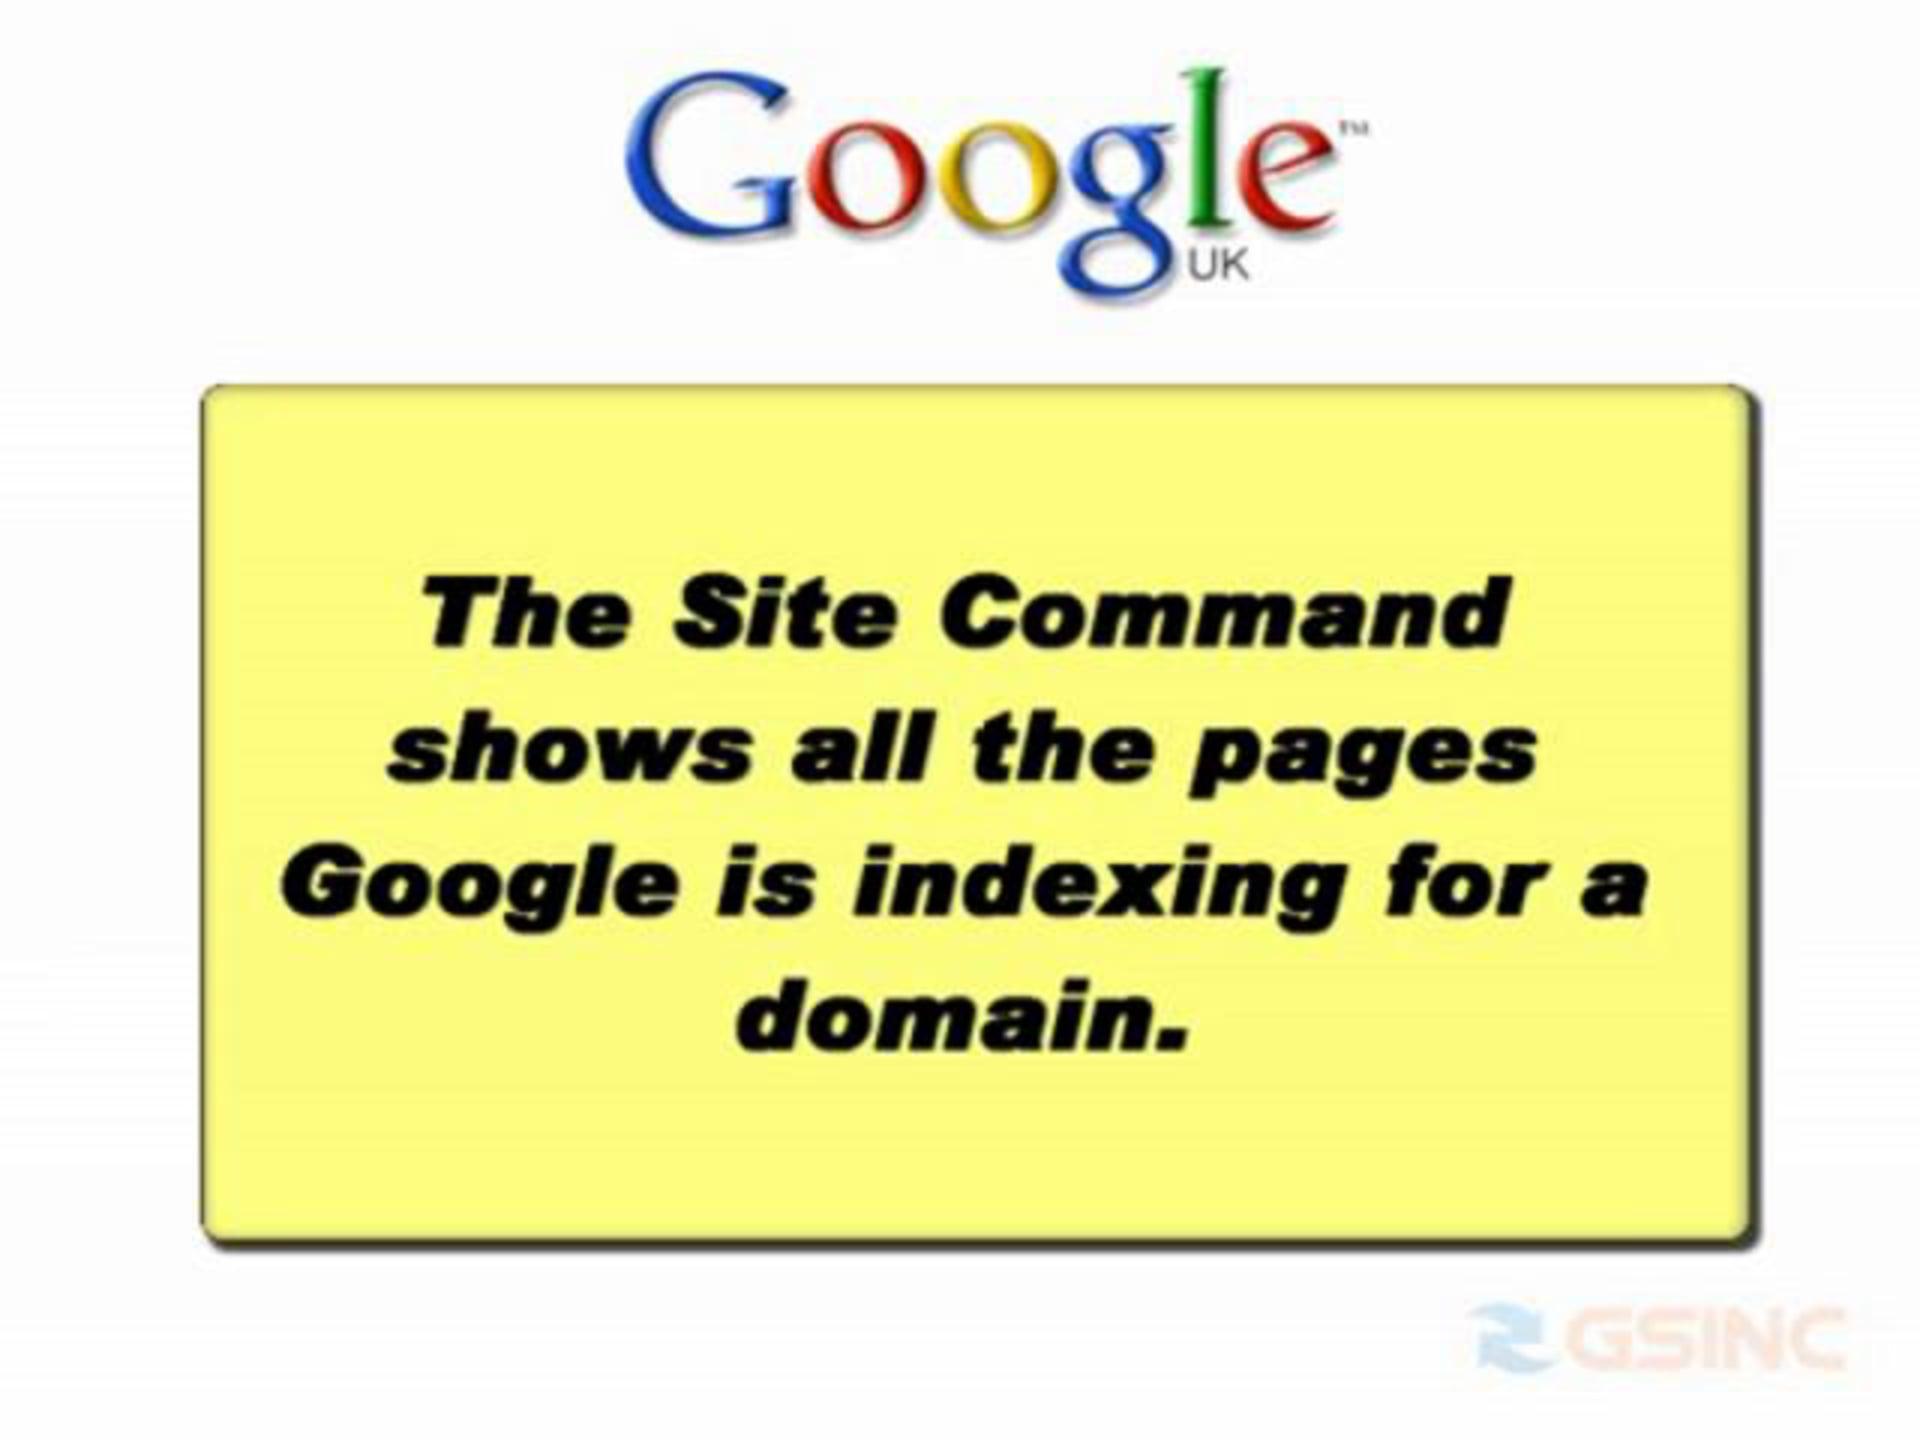 search-engine-optimization-tutorial-8211-google-site-command.jpg